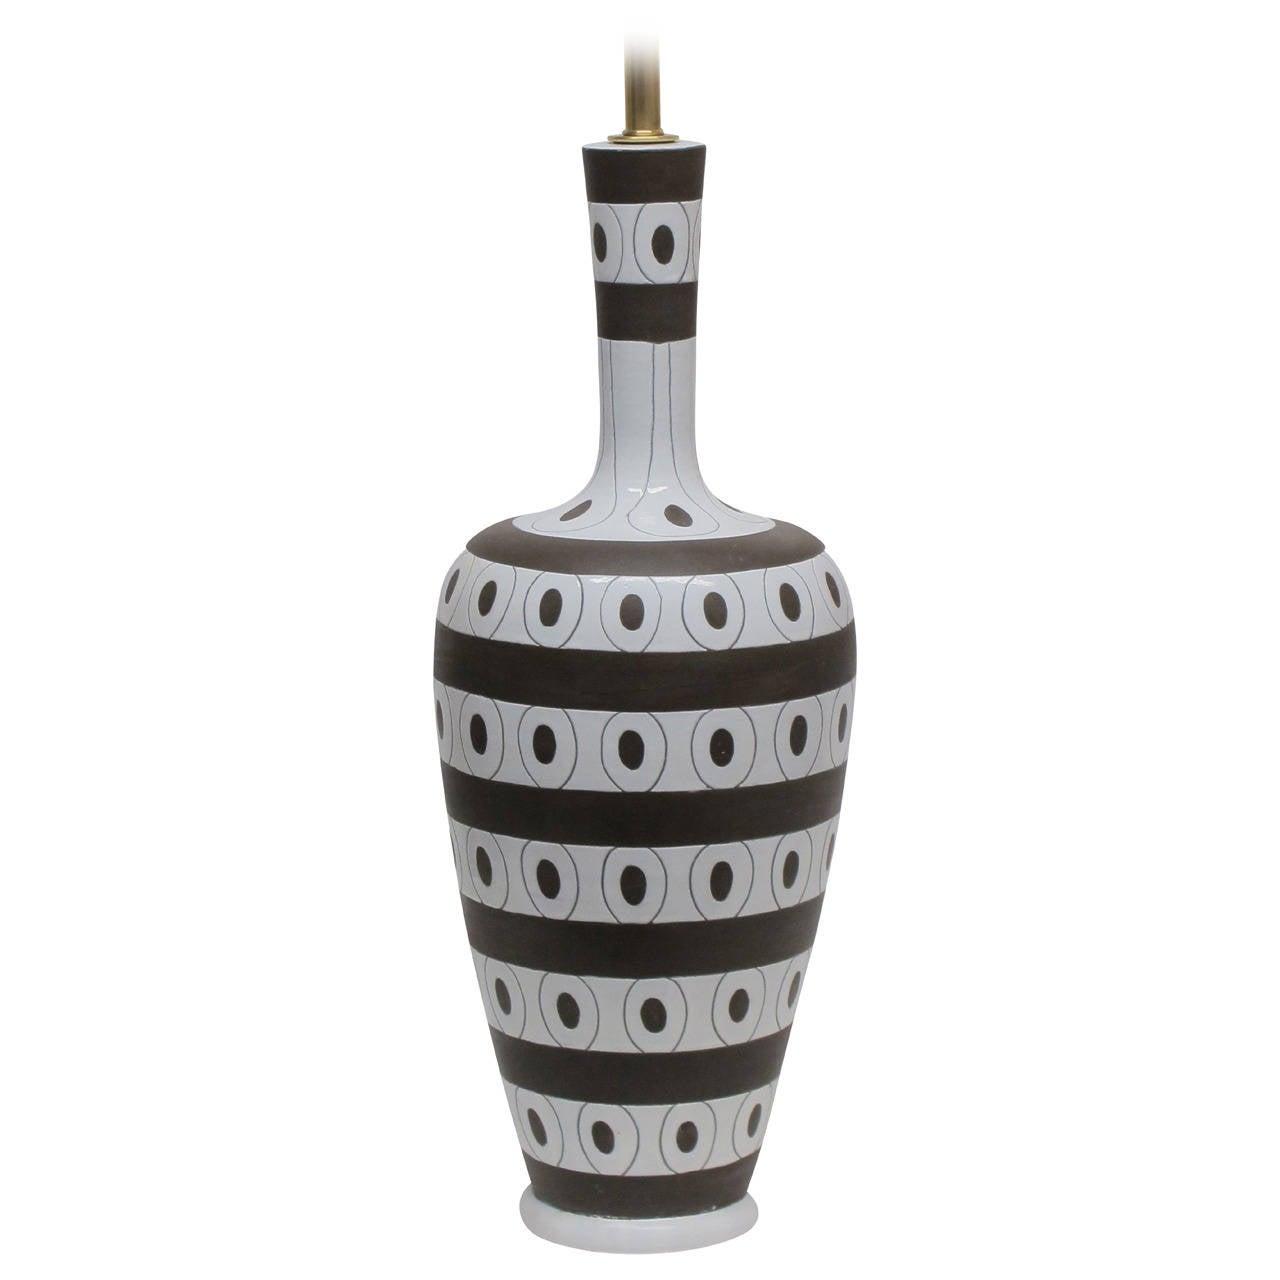 zaccagnini ceramic table lamp white brown stripes circles signed italy 1950u0027s 1